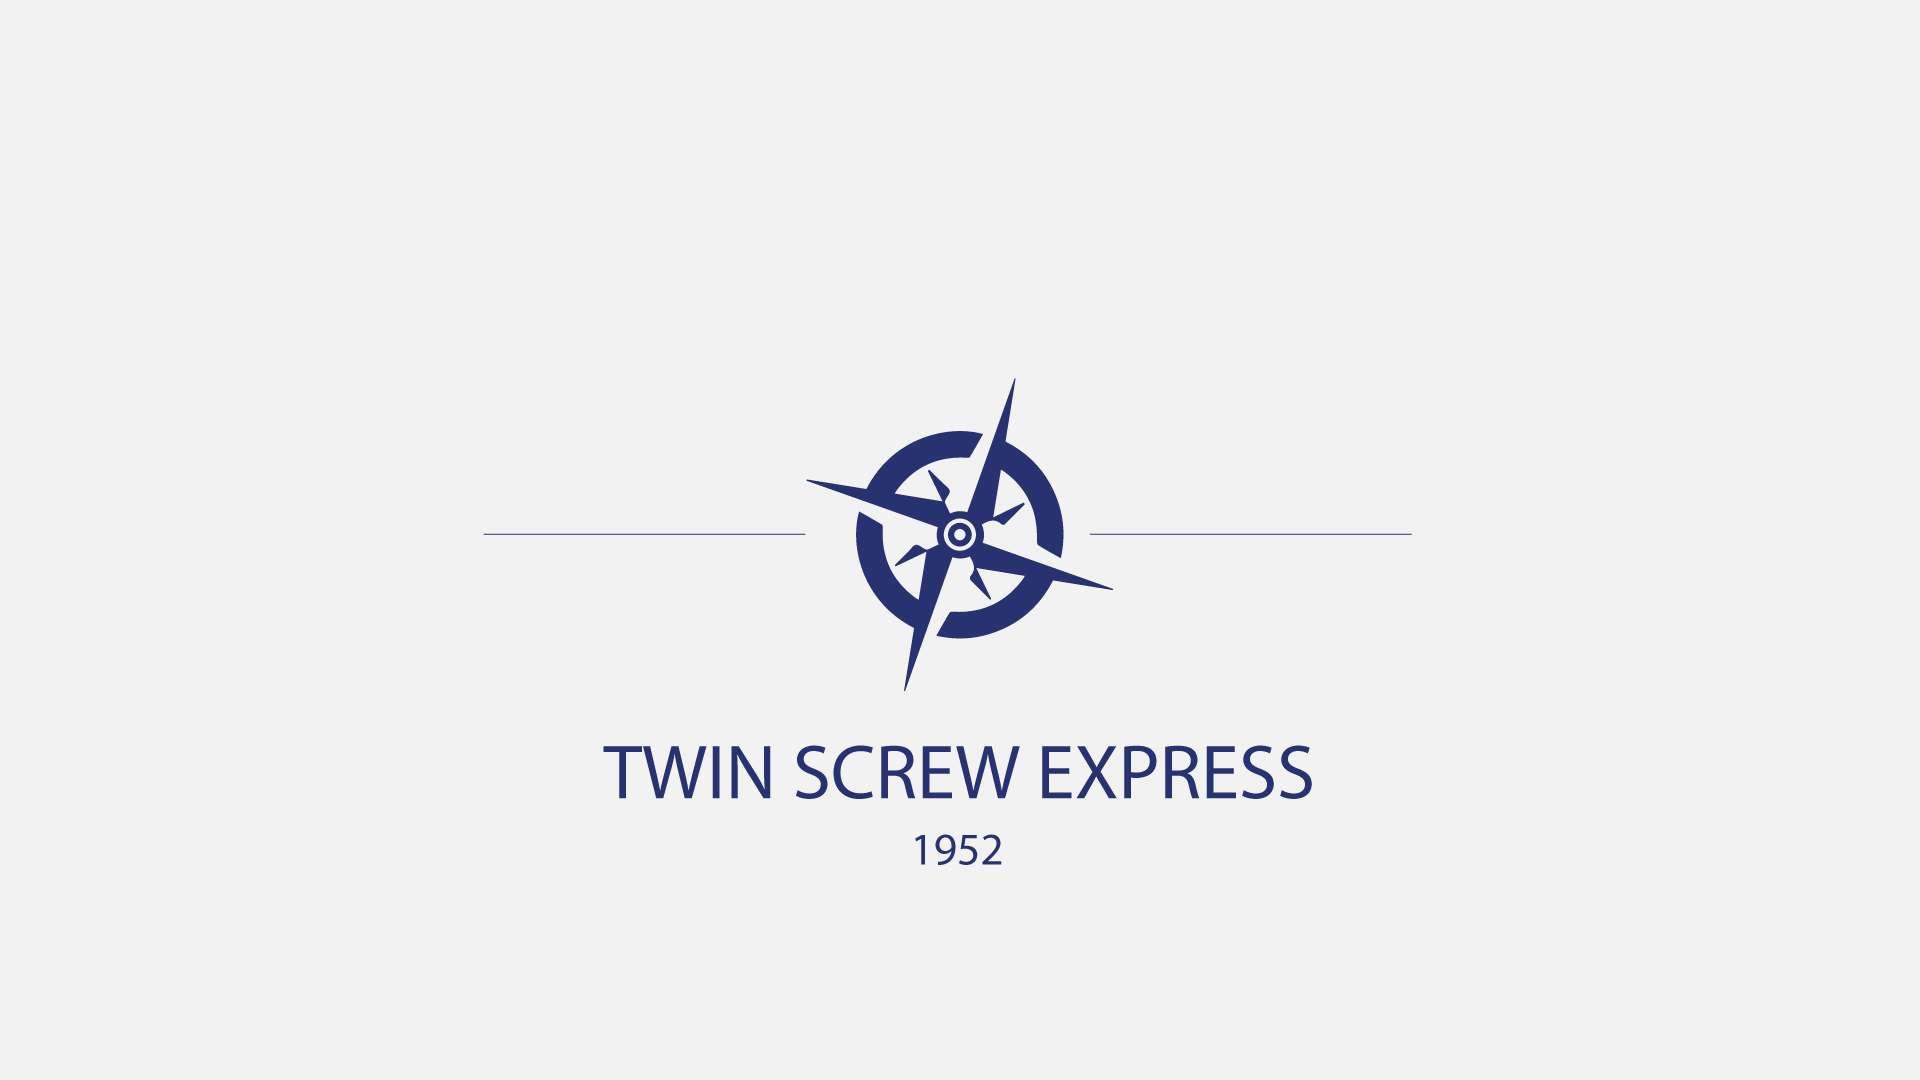 Twin Screw Express